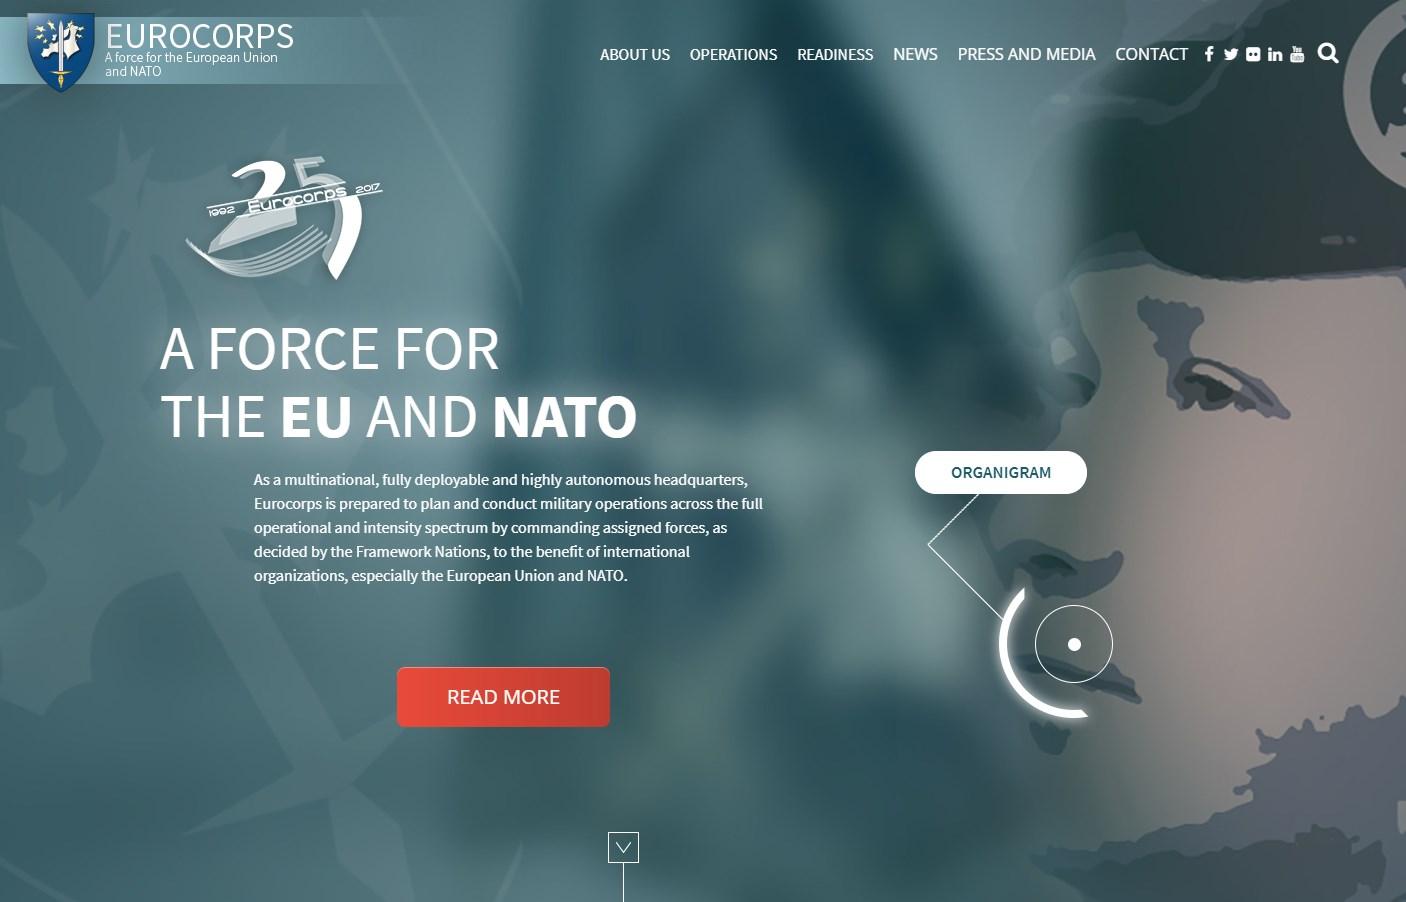 (c) Eurocorps.org